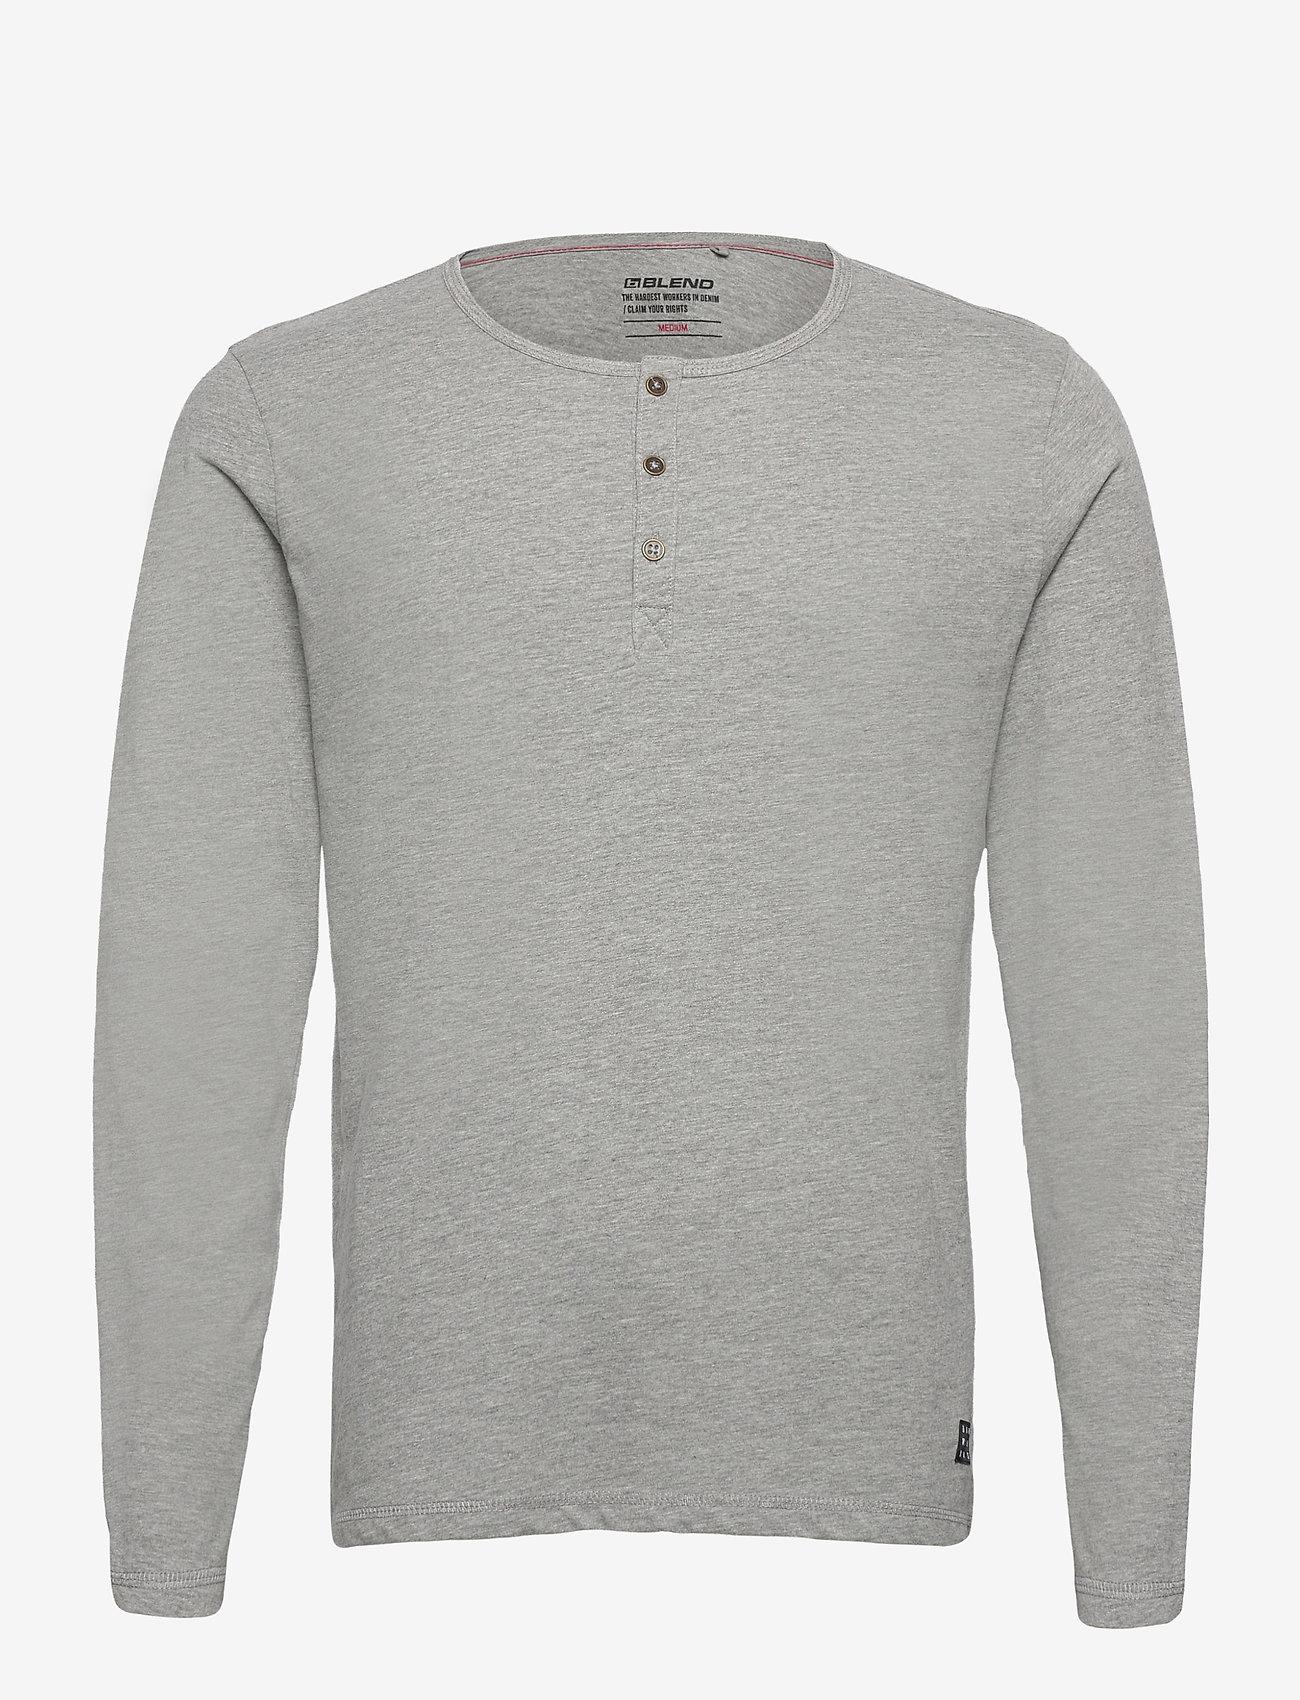 Blend - Tee - t-shirts basiques - stone mix - 0